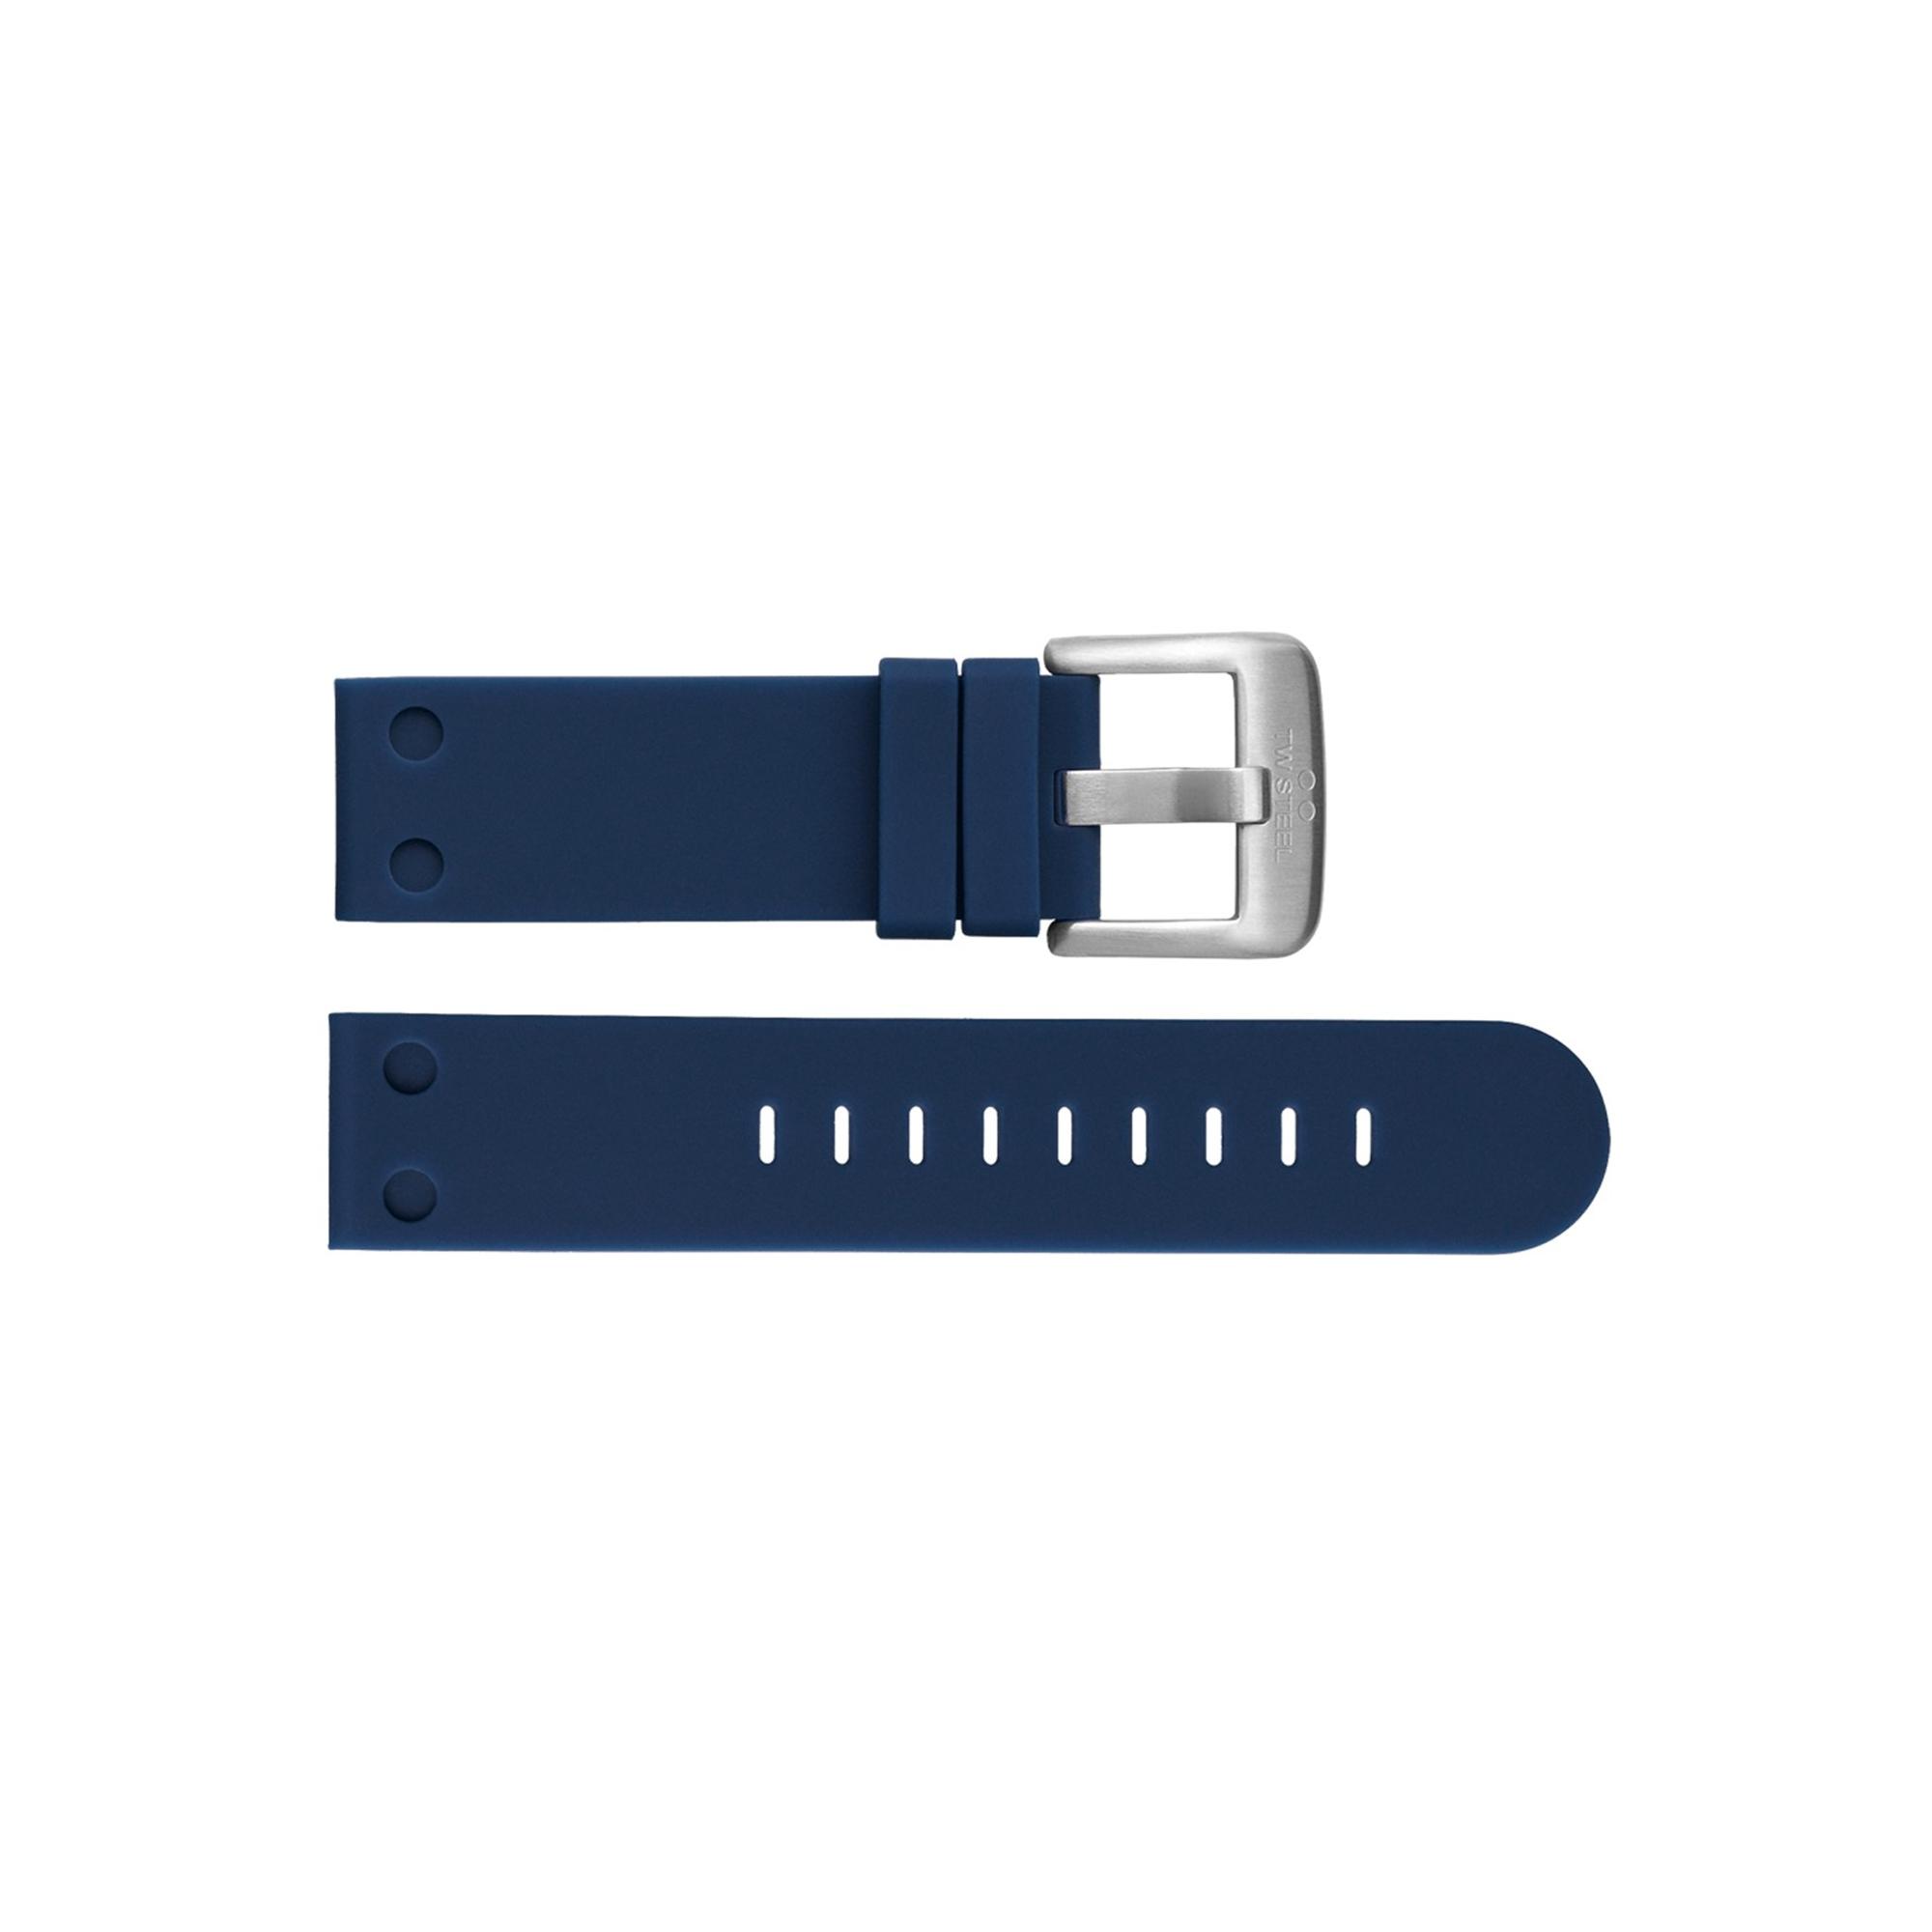 TW Steel horlogeband TWB585 Silicoon Blauw 22mm